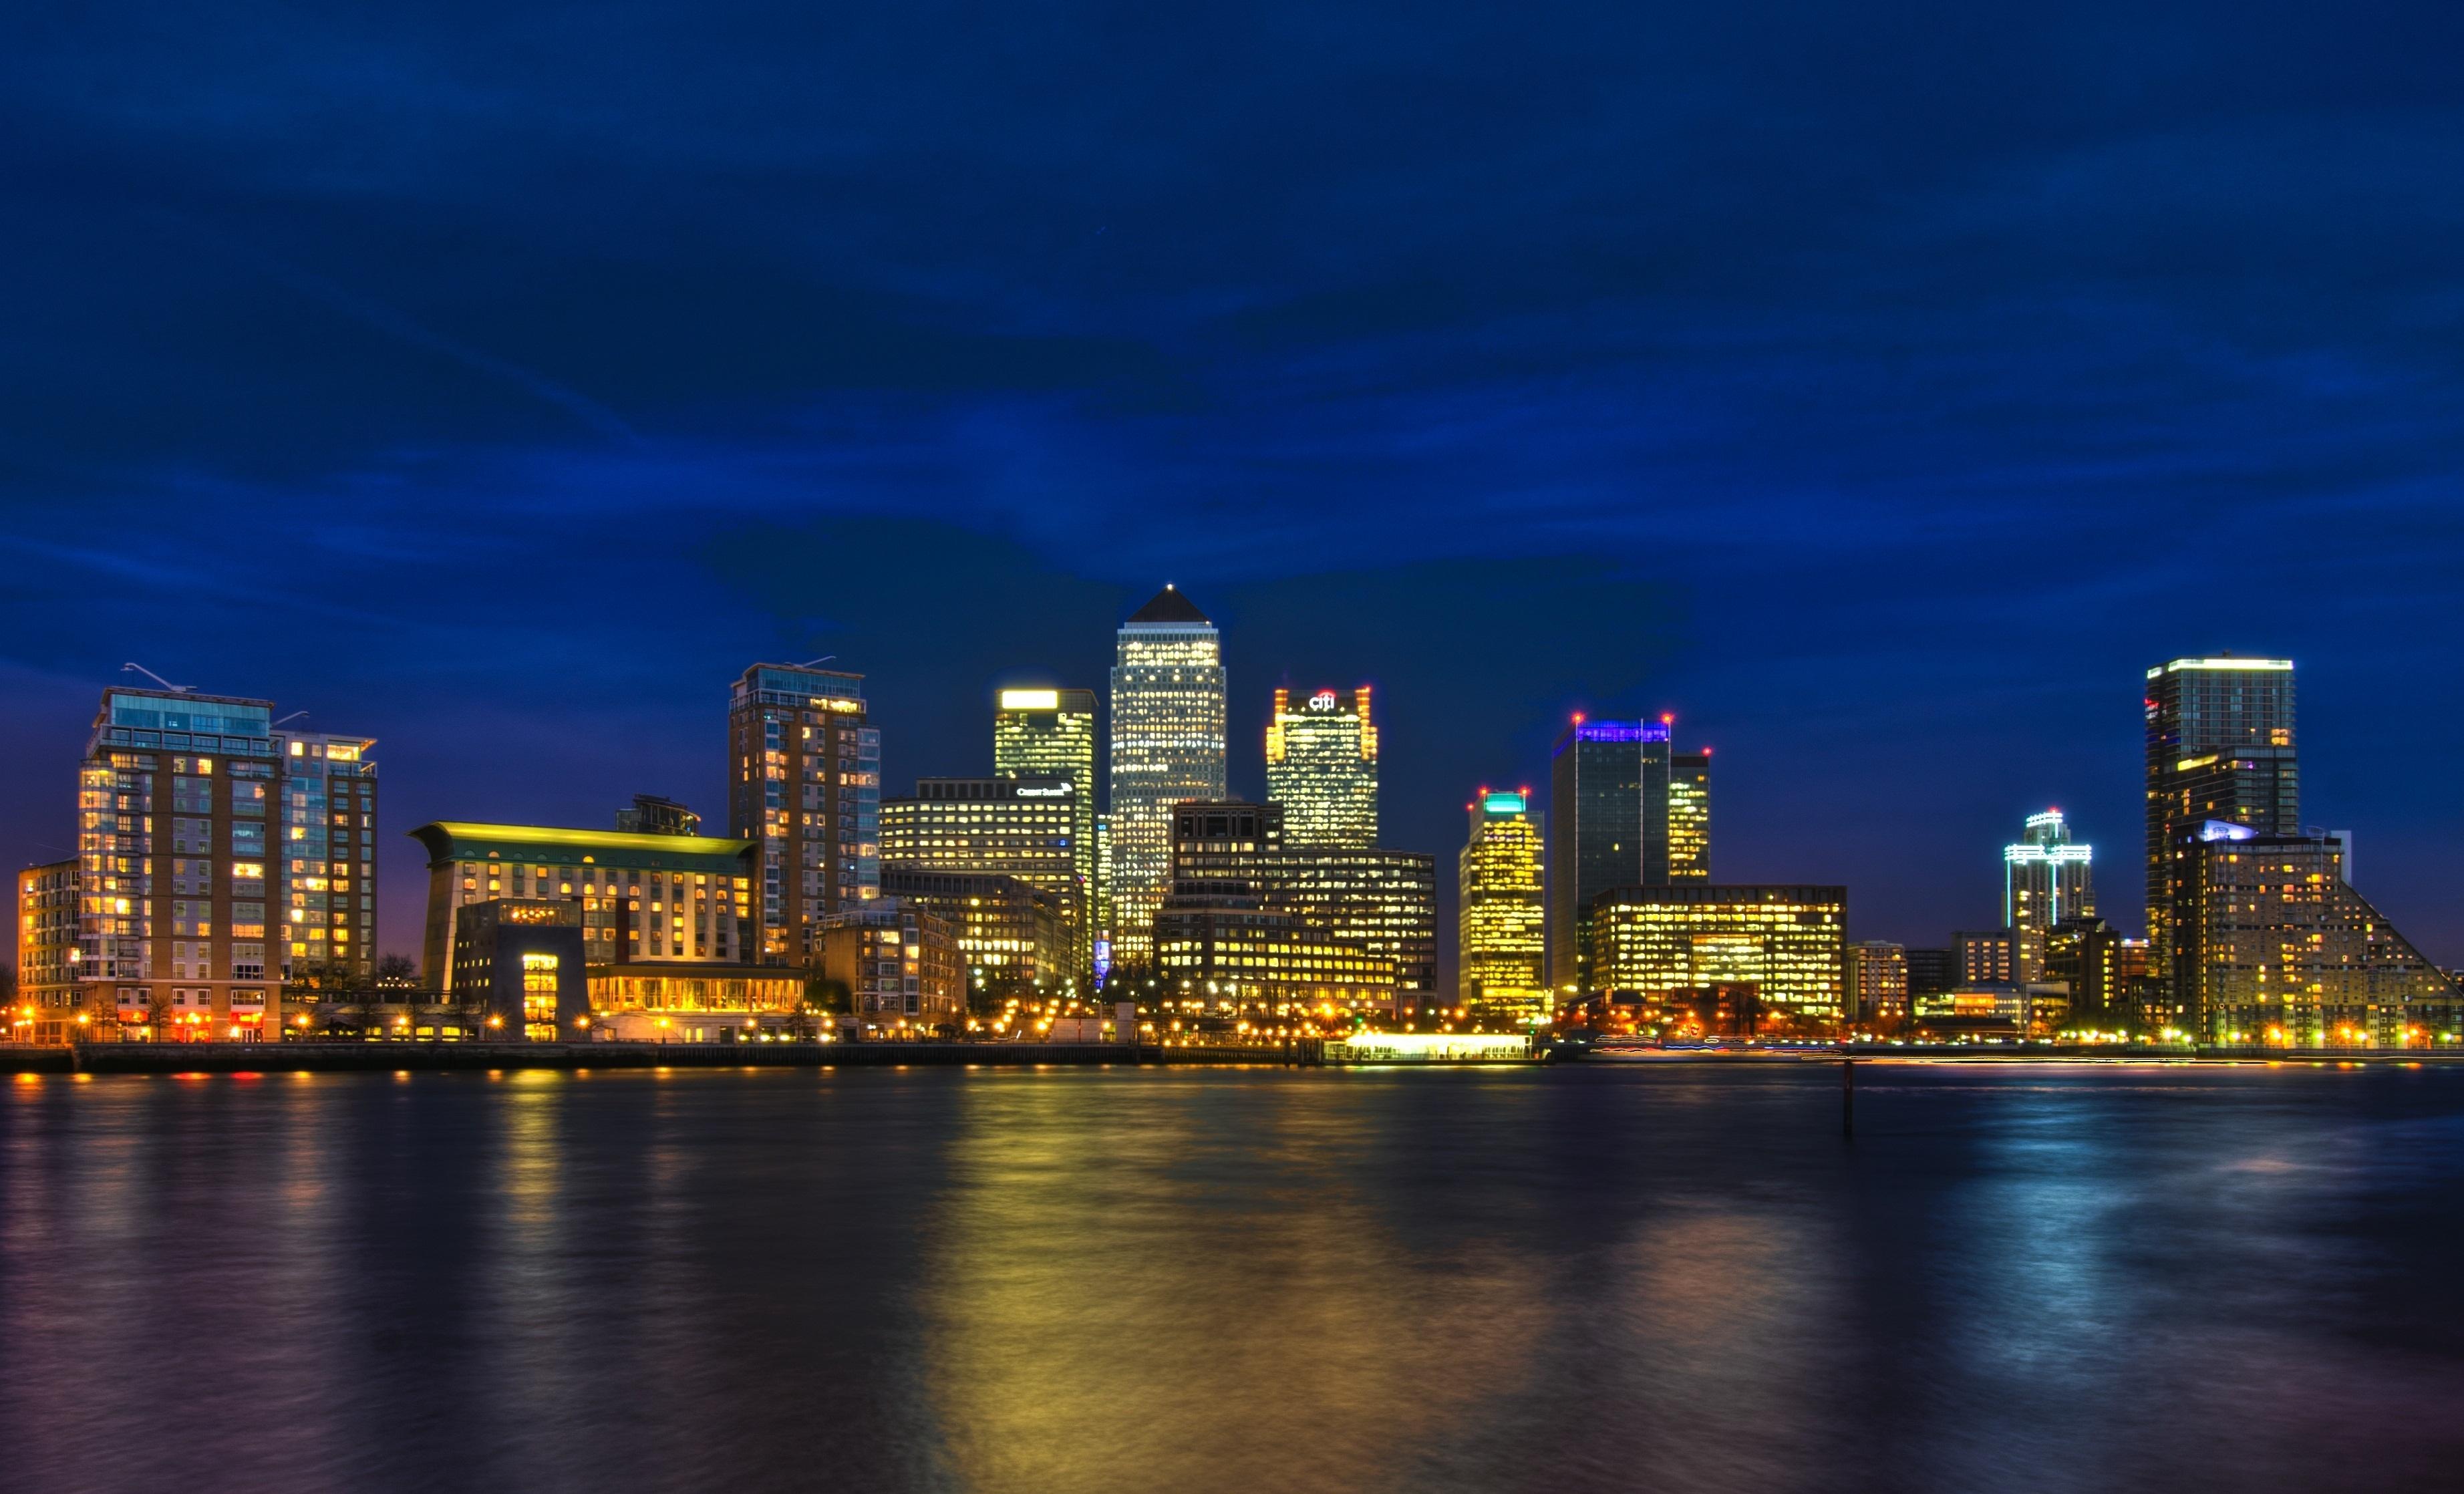 London Night Skyline Wallpaper | www.pixshark.com - Images ...